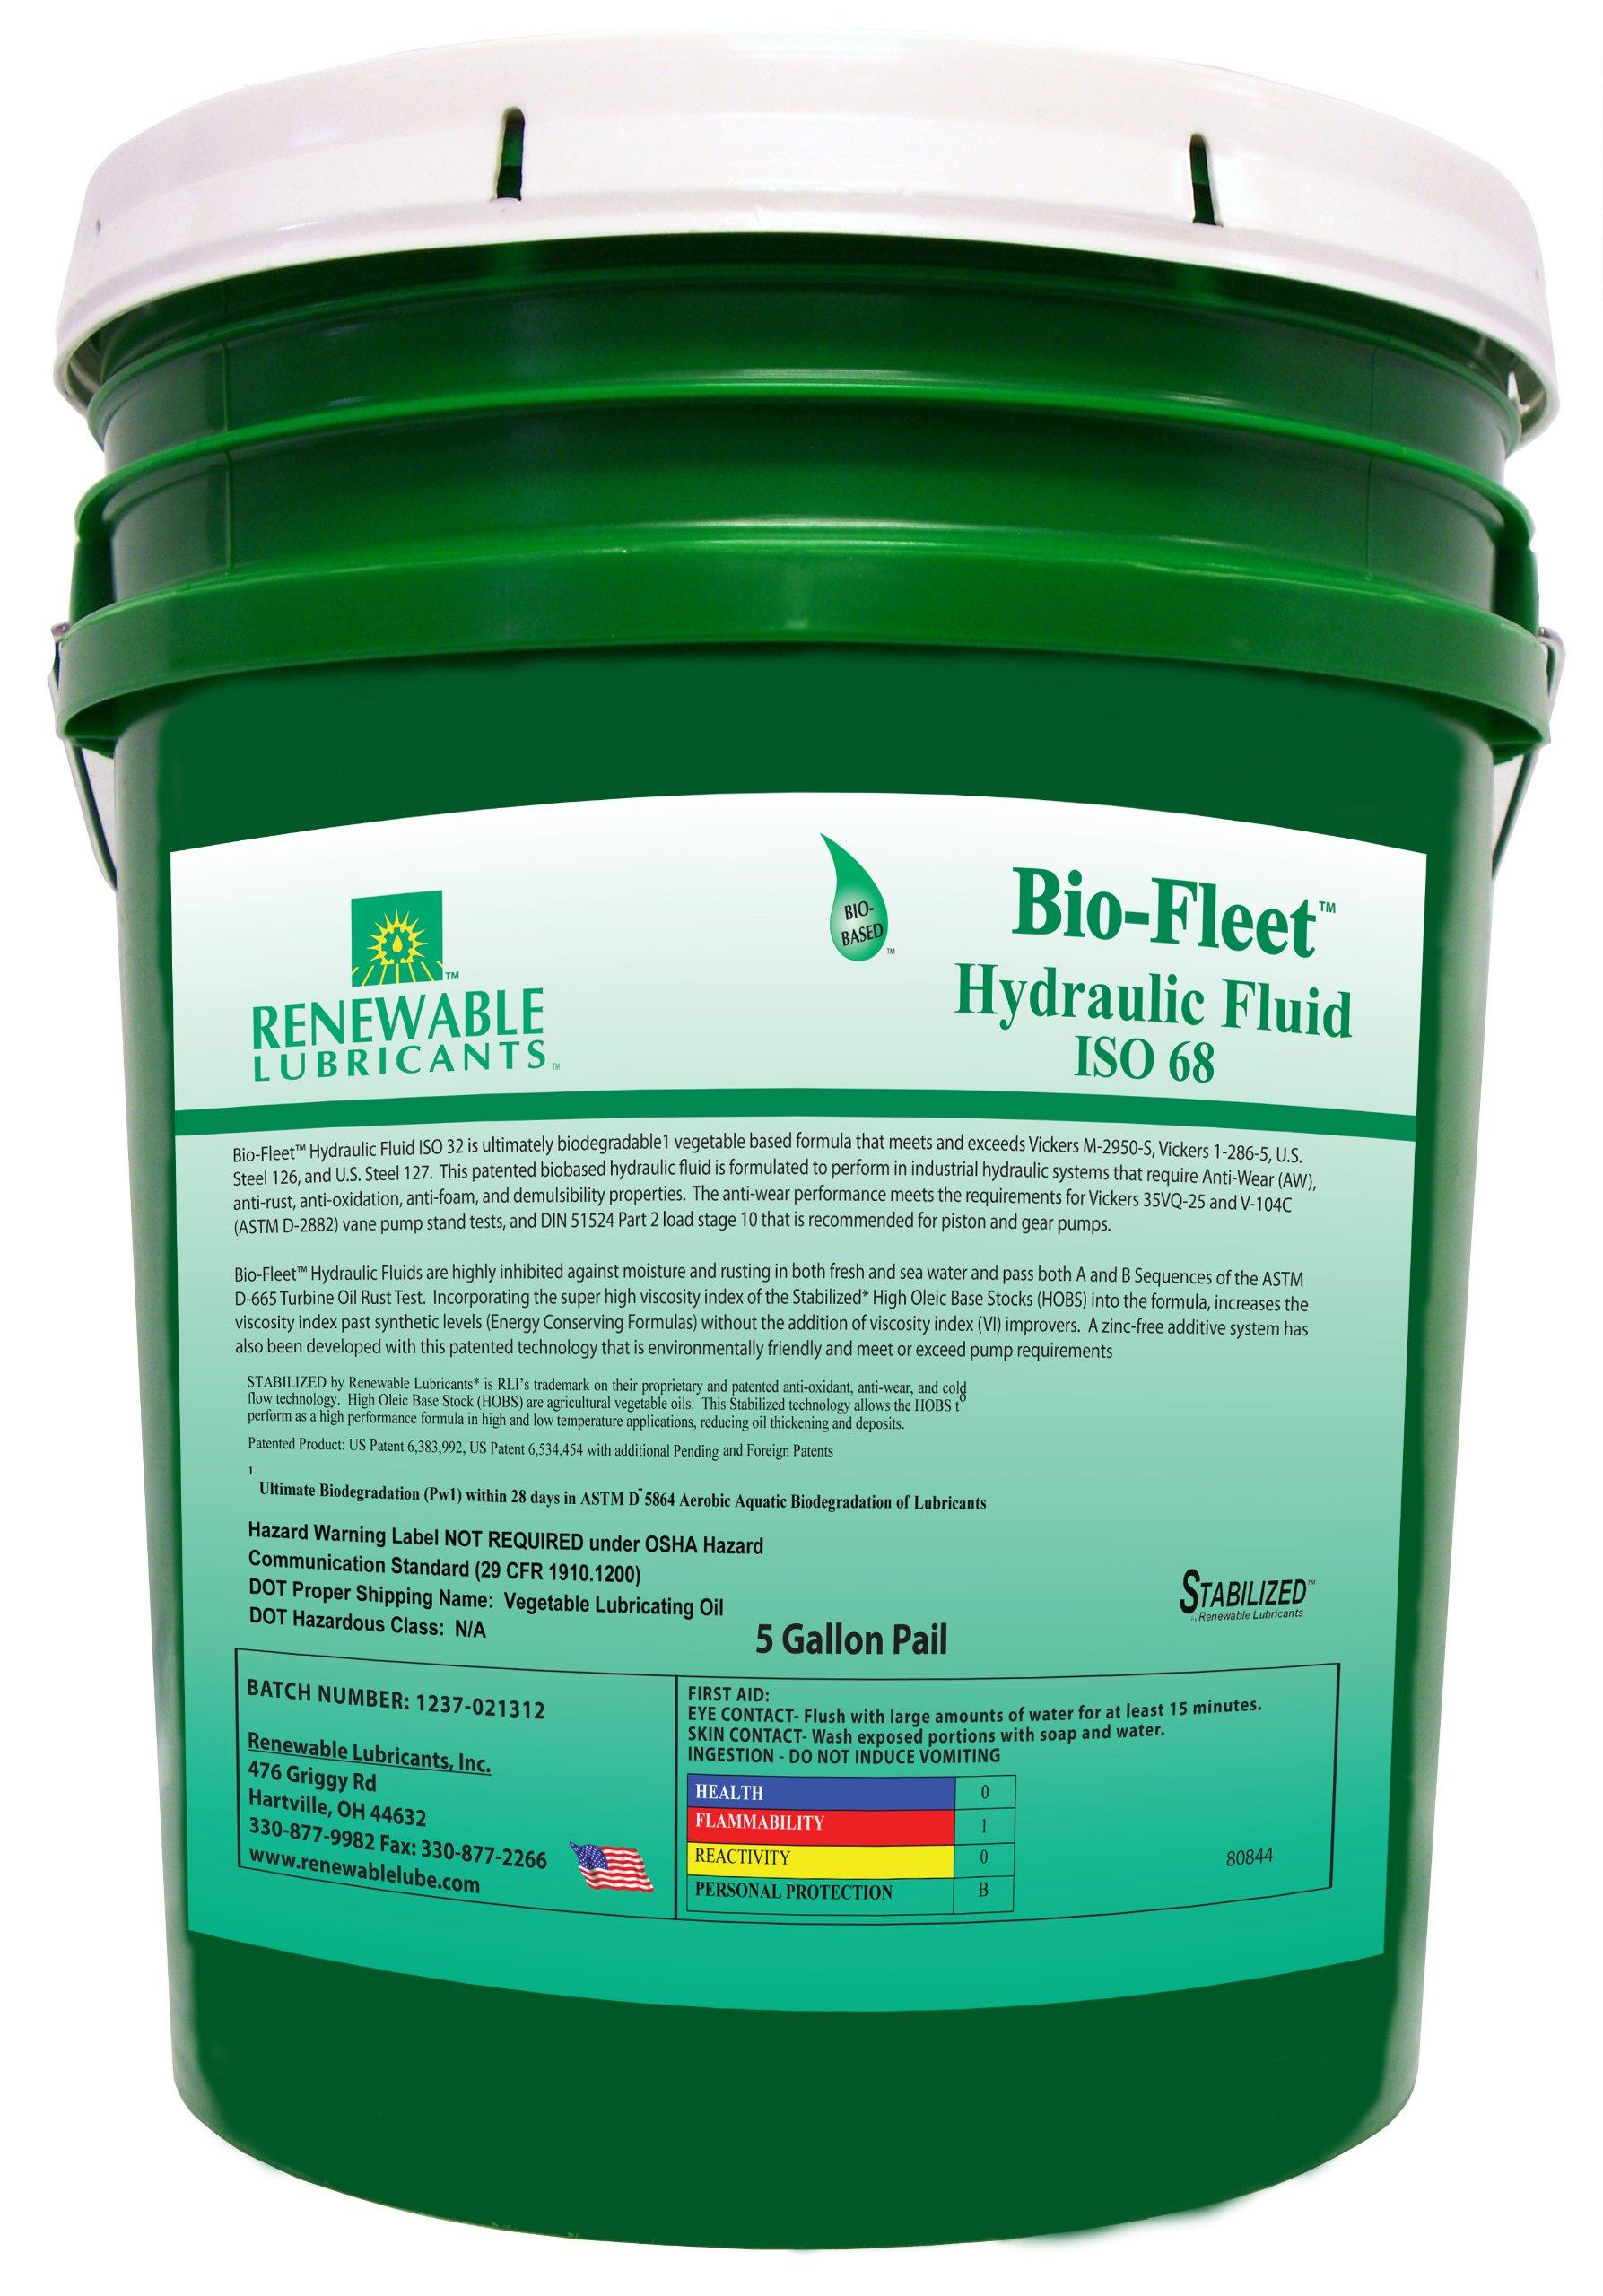 Renewable Lubricants Bio-Fleet ISO 68 Hydraulic Lubricant, 5 Gallon Pail